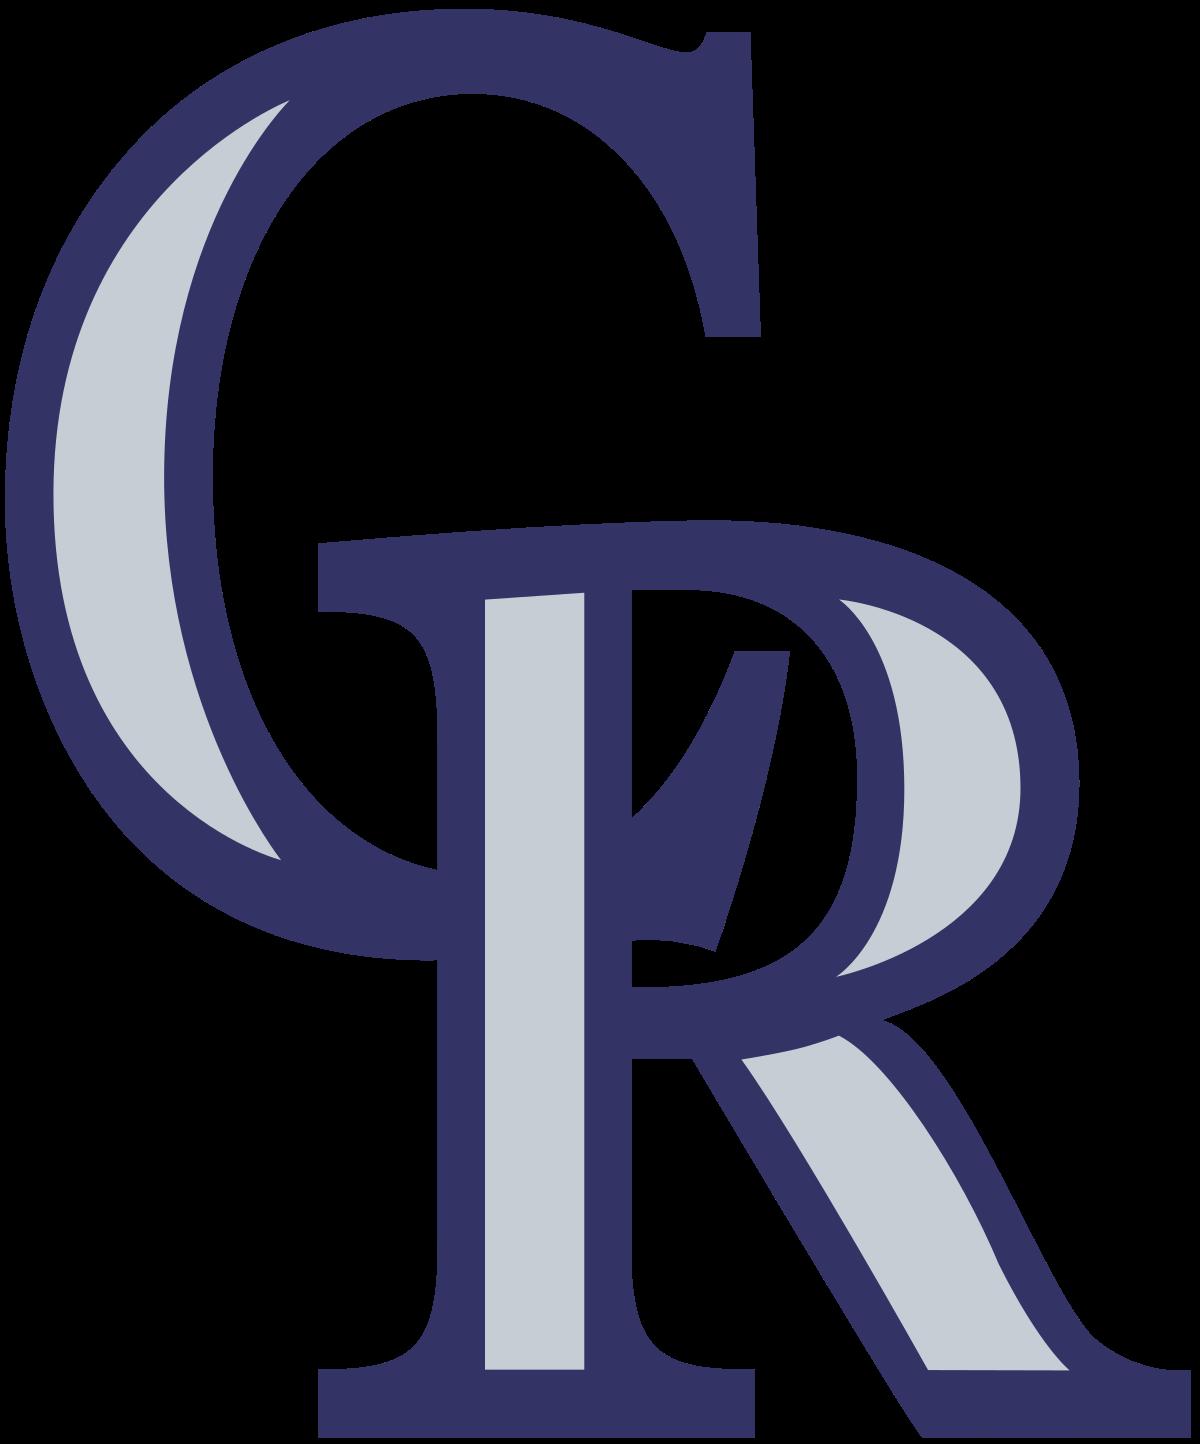 Clipart of royals baseball hat png royalty free stock Colorado Rockies - Wikipedia png royalty free stock